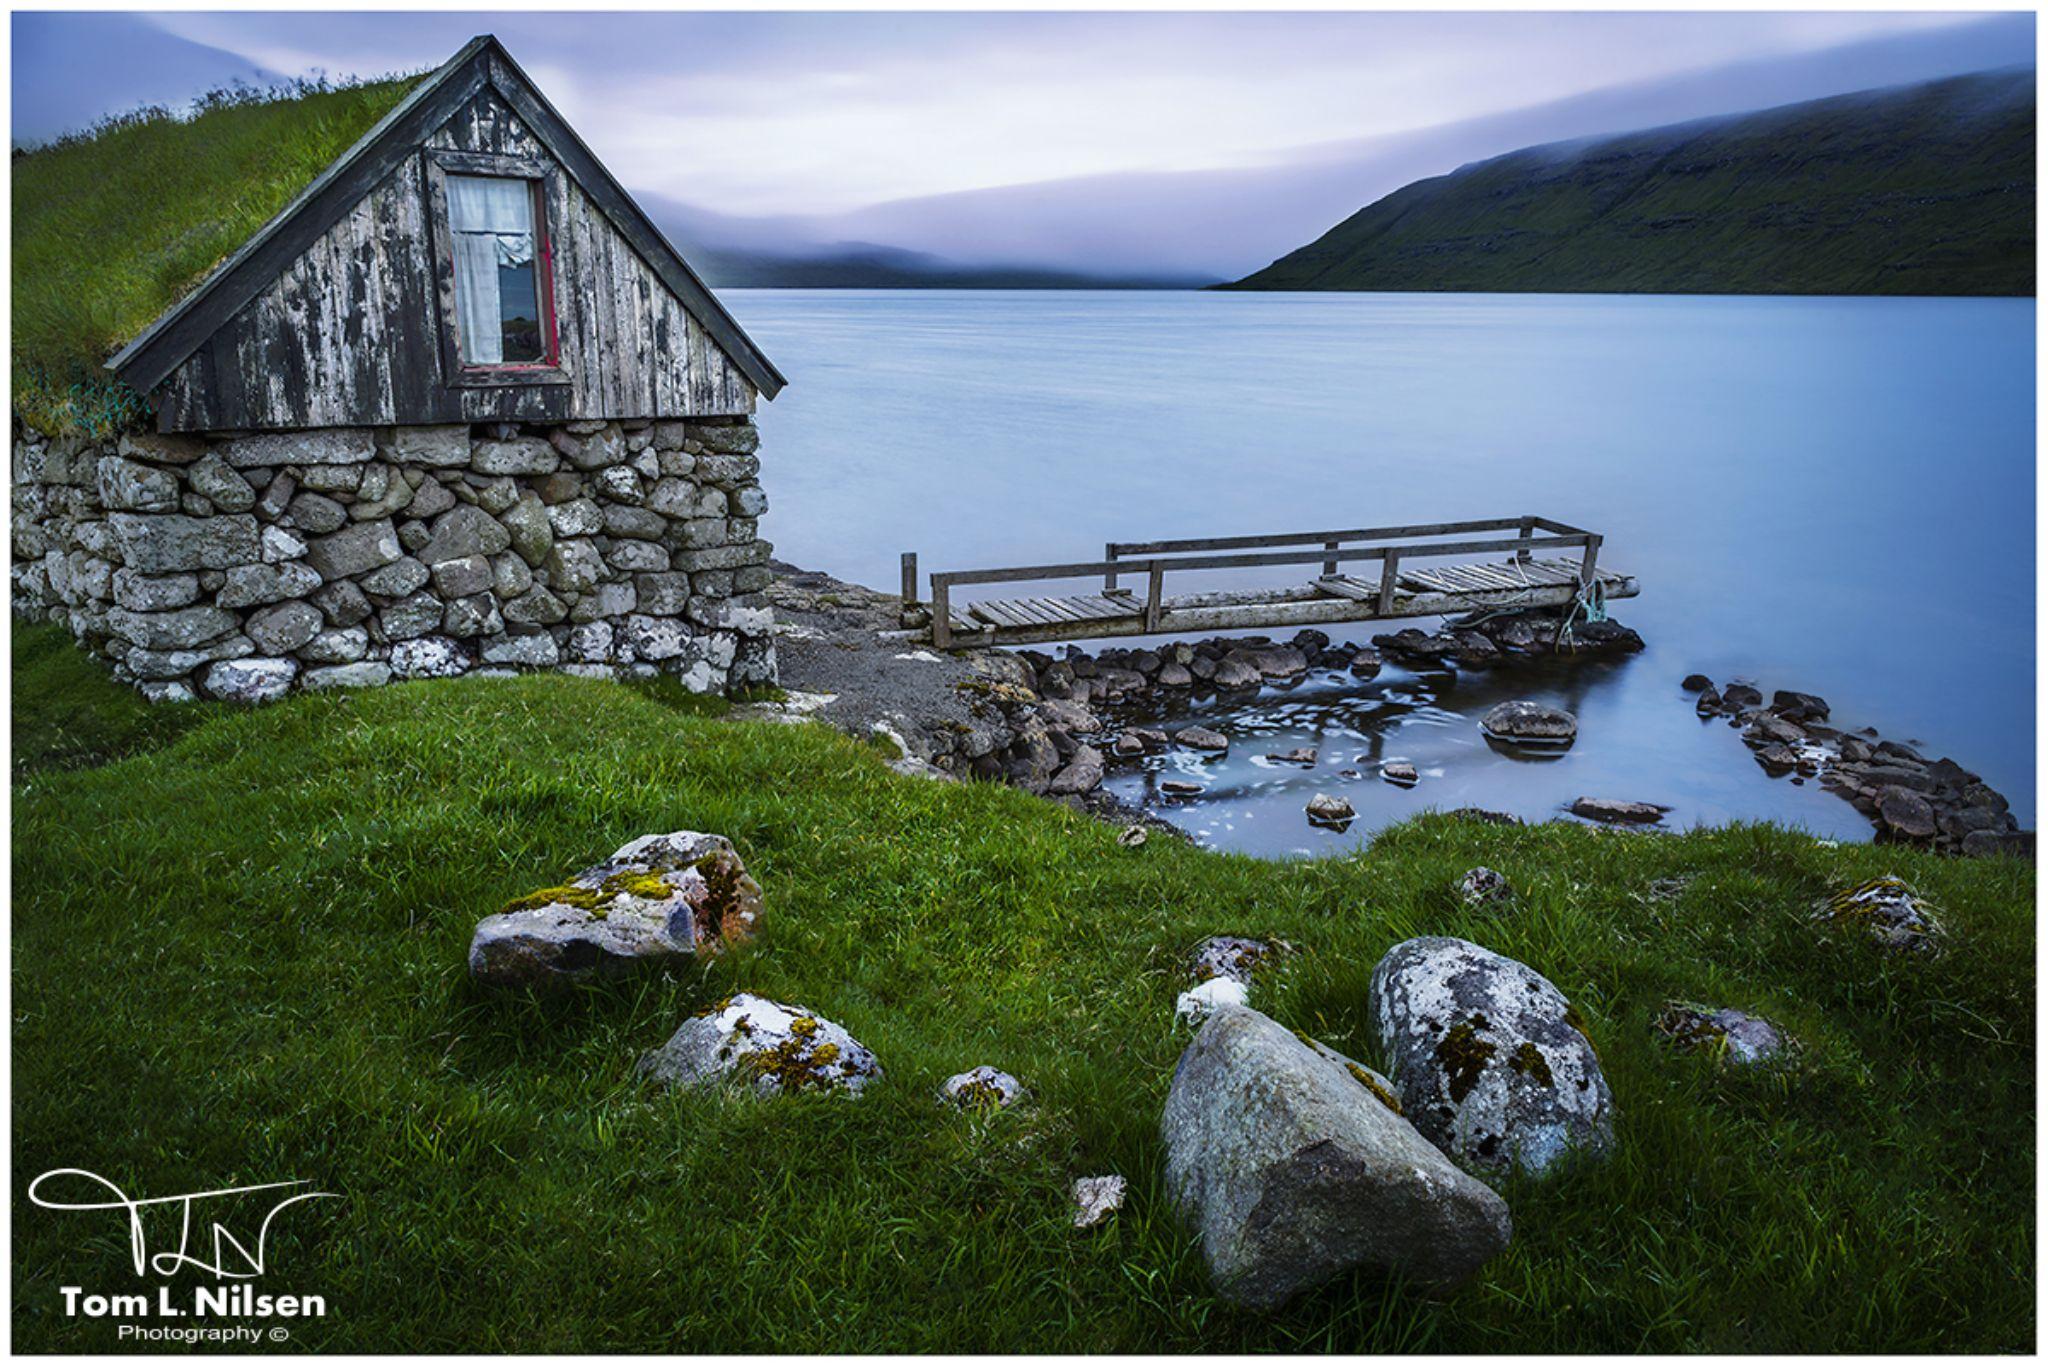 Sørvagsvatn (Leitisvatn) in Vagar. by Tom L. Nilsen